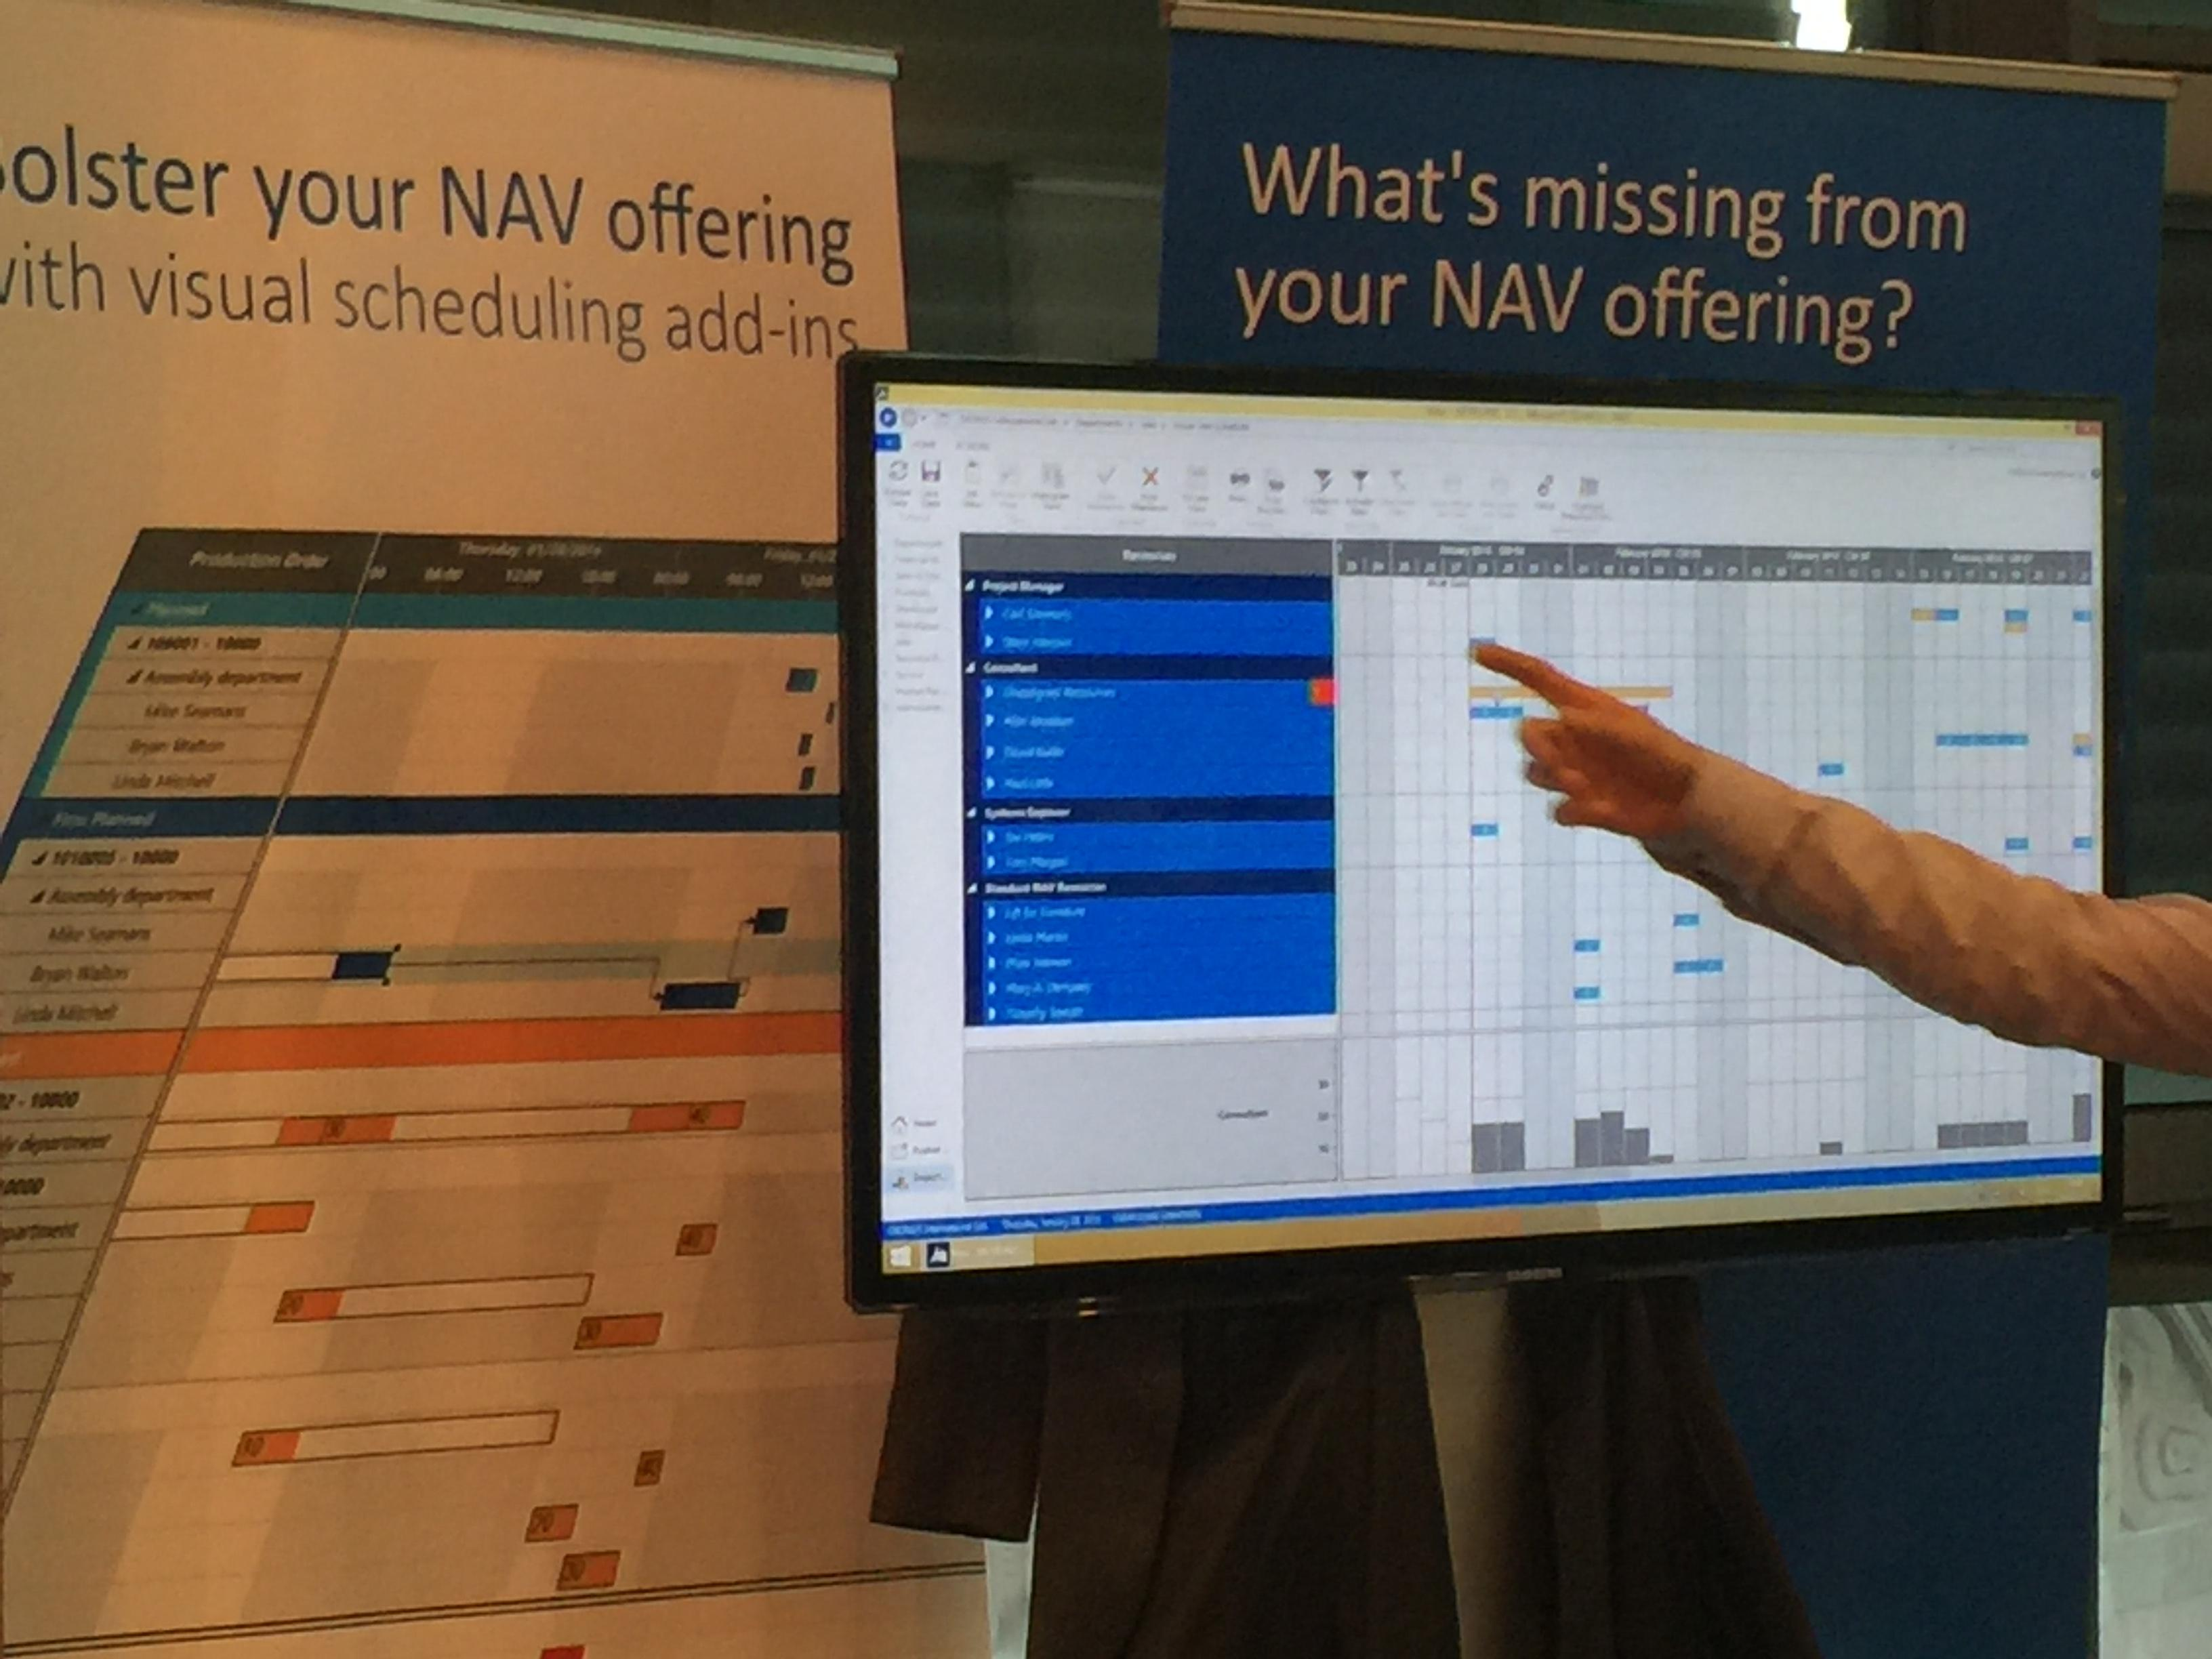 Visual_Scheduling_Add-ins_NAV_Directions_EMEA.jpg